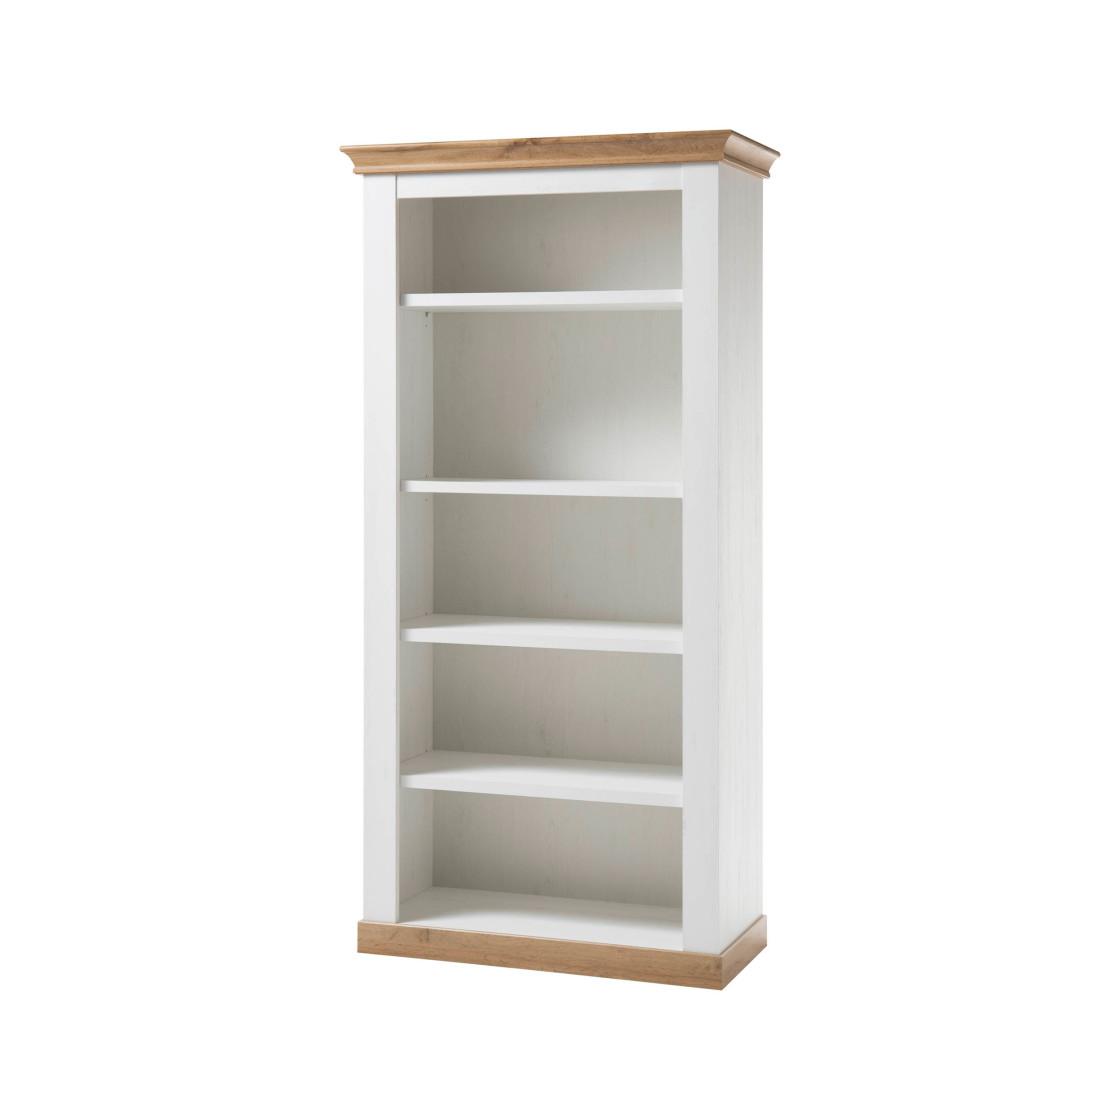 regal landhaus pinie wei applikation wotan eiche 219. Black Bedroom Furniture Sets. Home Design Ideas